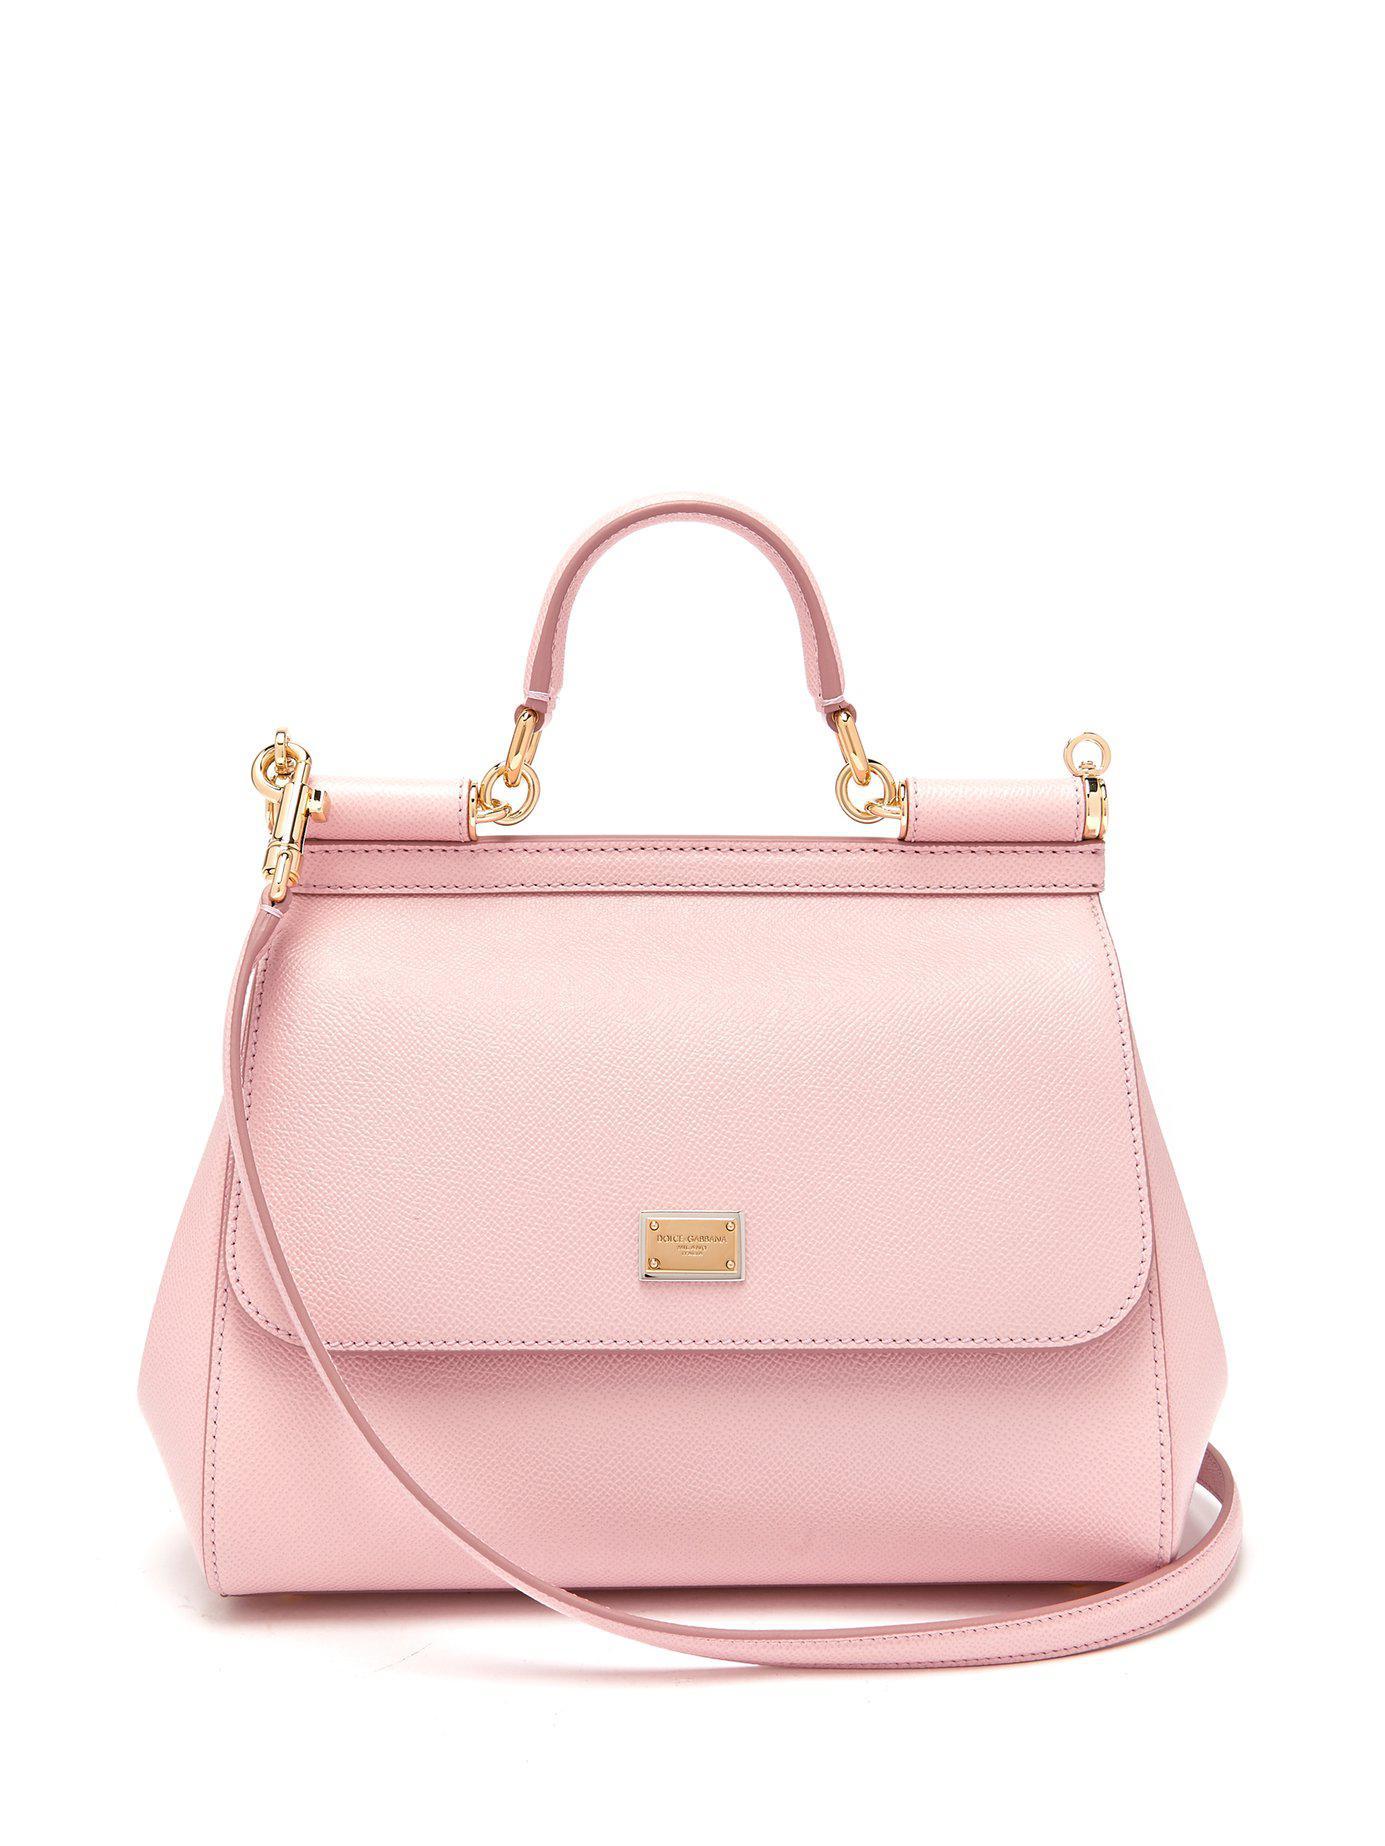 10bd7d903a8b Lyst - Dolce   Gabbana Sicily Medium Dauphine Leather Bag in Pink ...